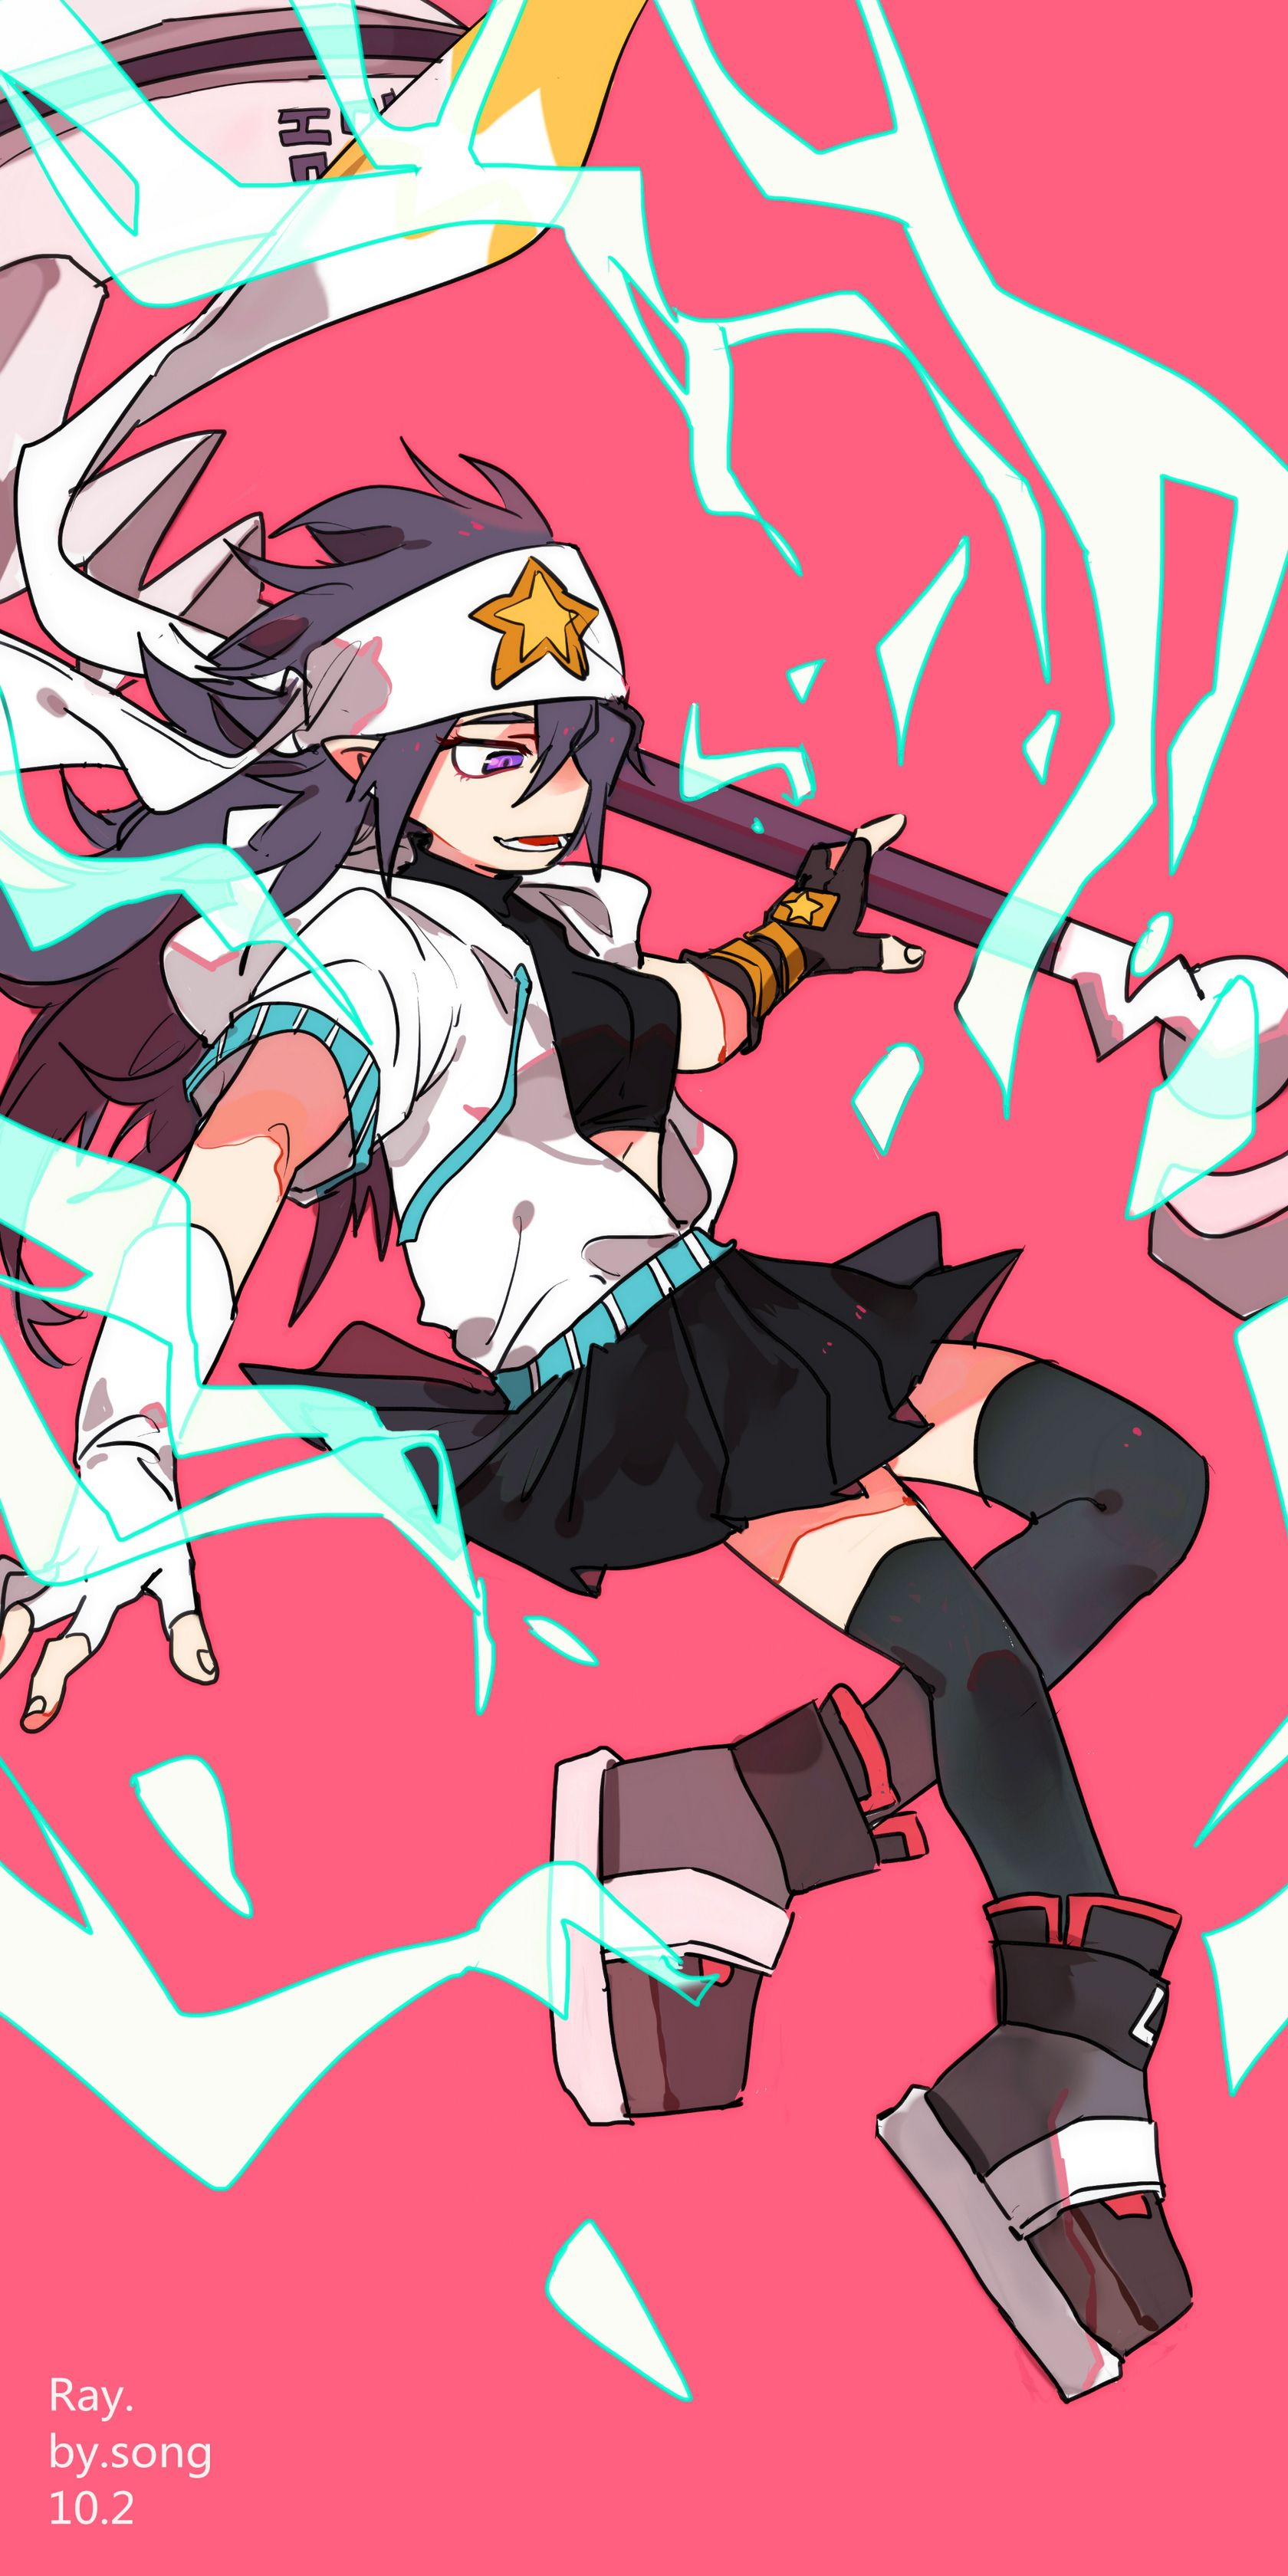 Pin by Chandl on AOTU Persona 5 joker, Anime, Genderbend